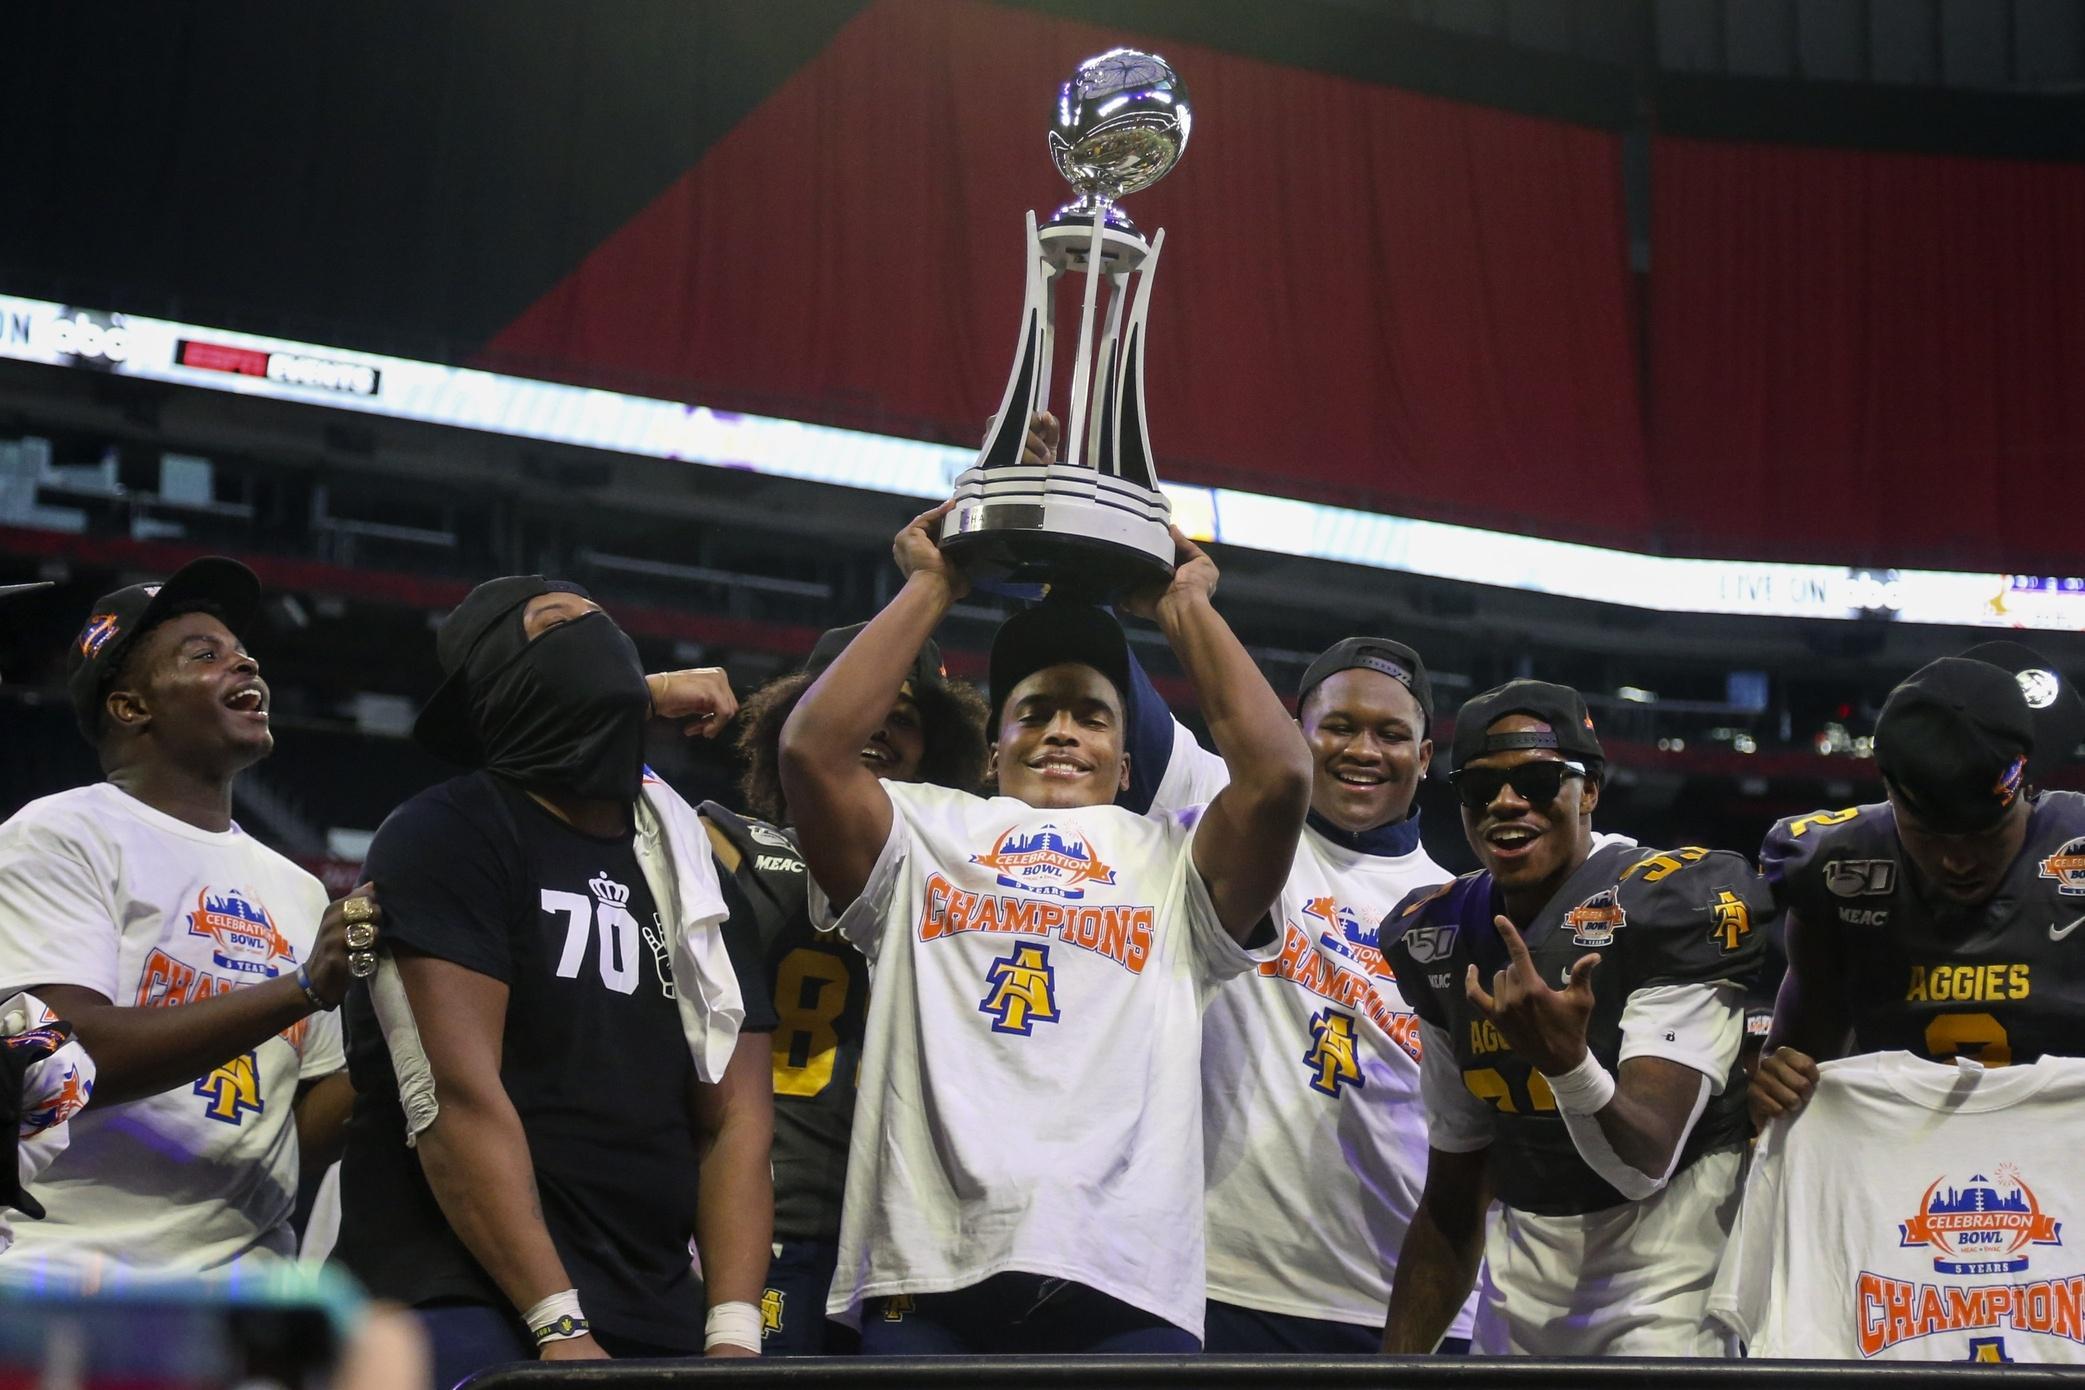 North Carolina A&T hoists the 2019 Celebration Bowl trophy